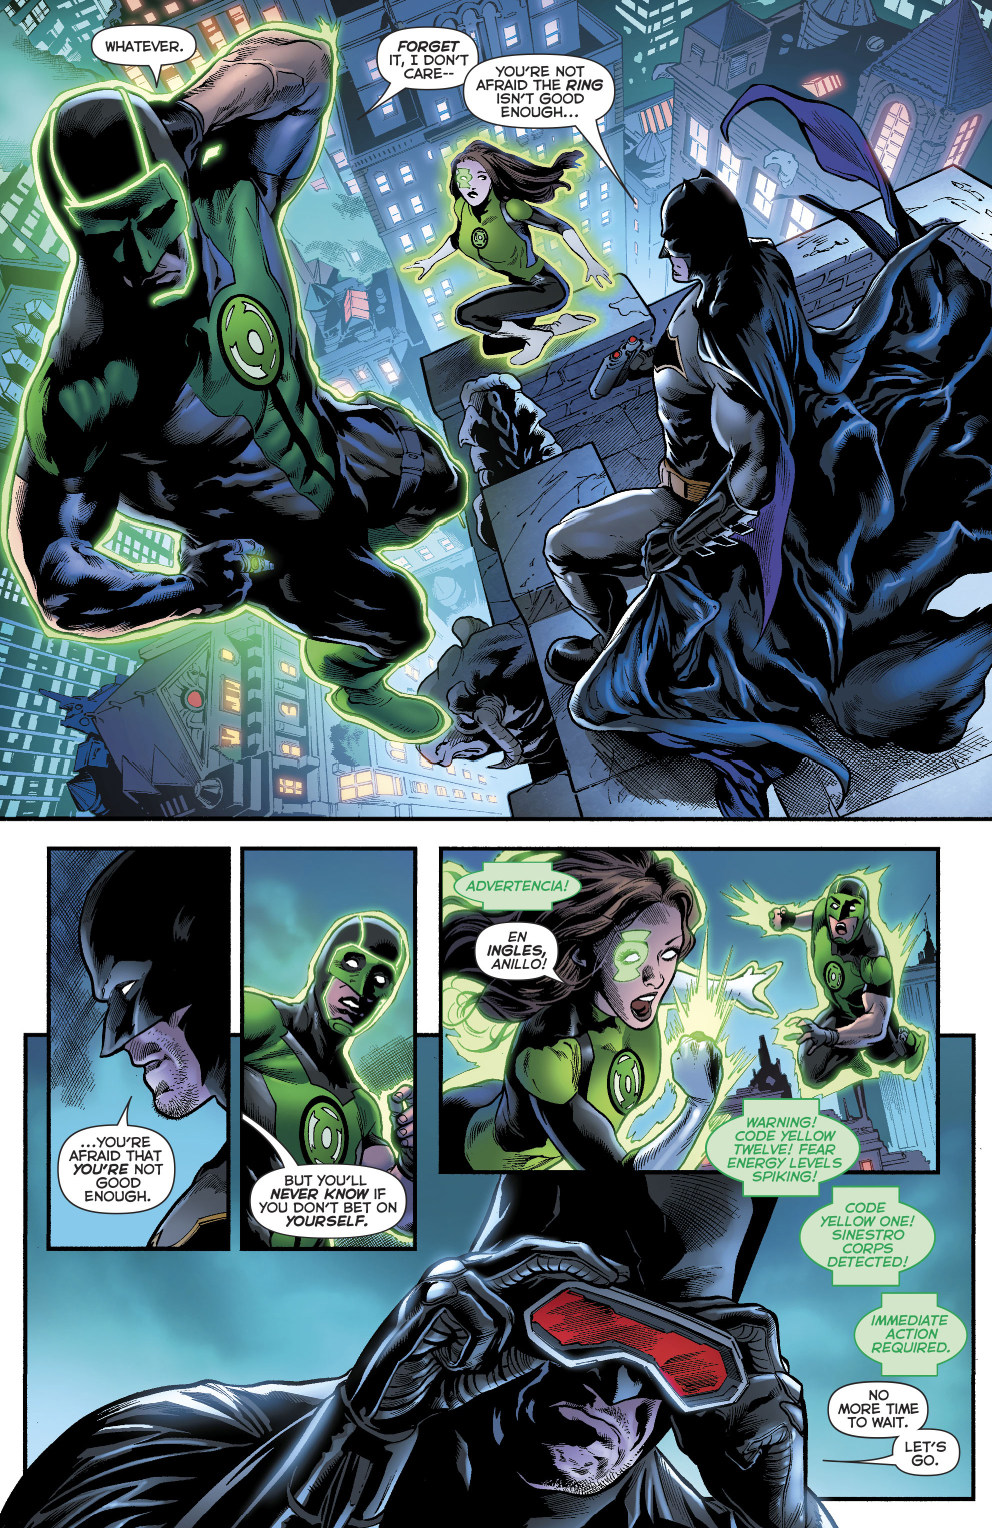 batman-explains-simon-bazs-real-fear